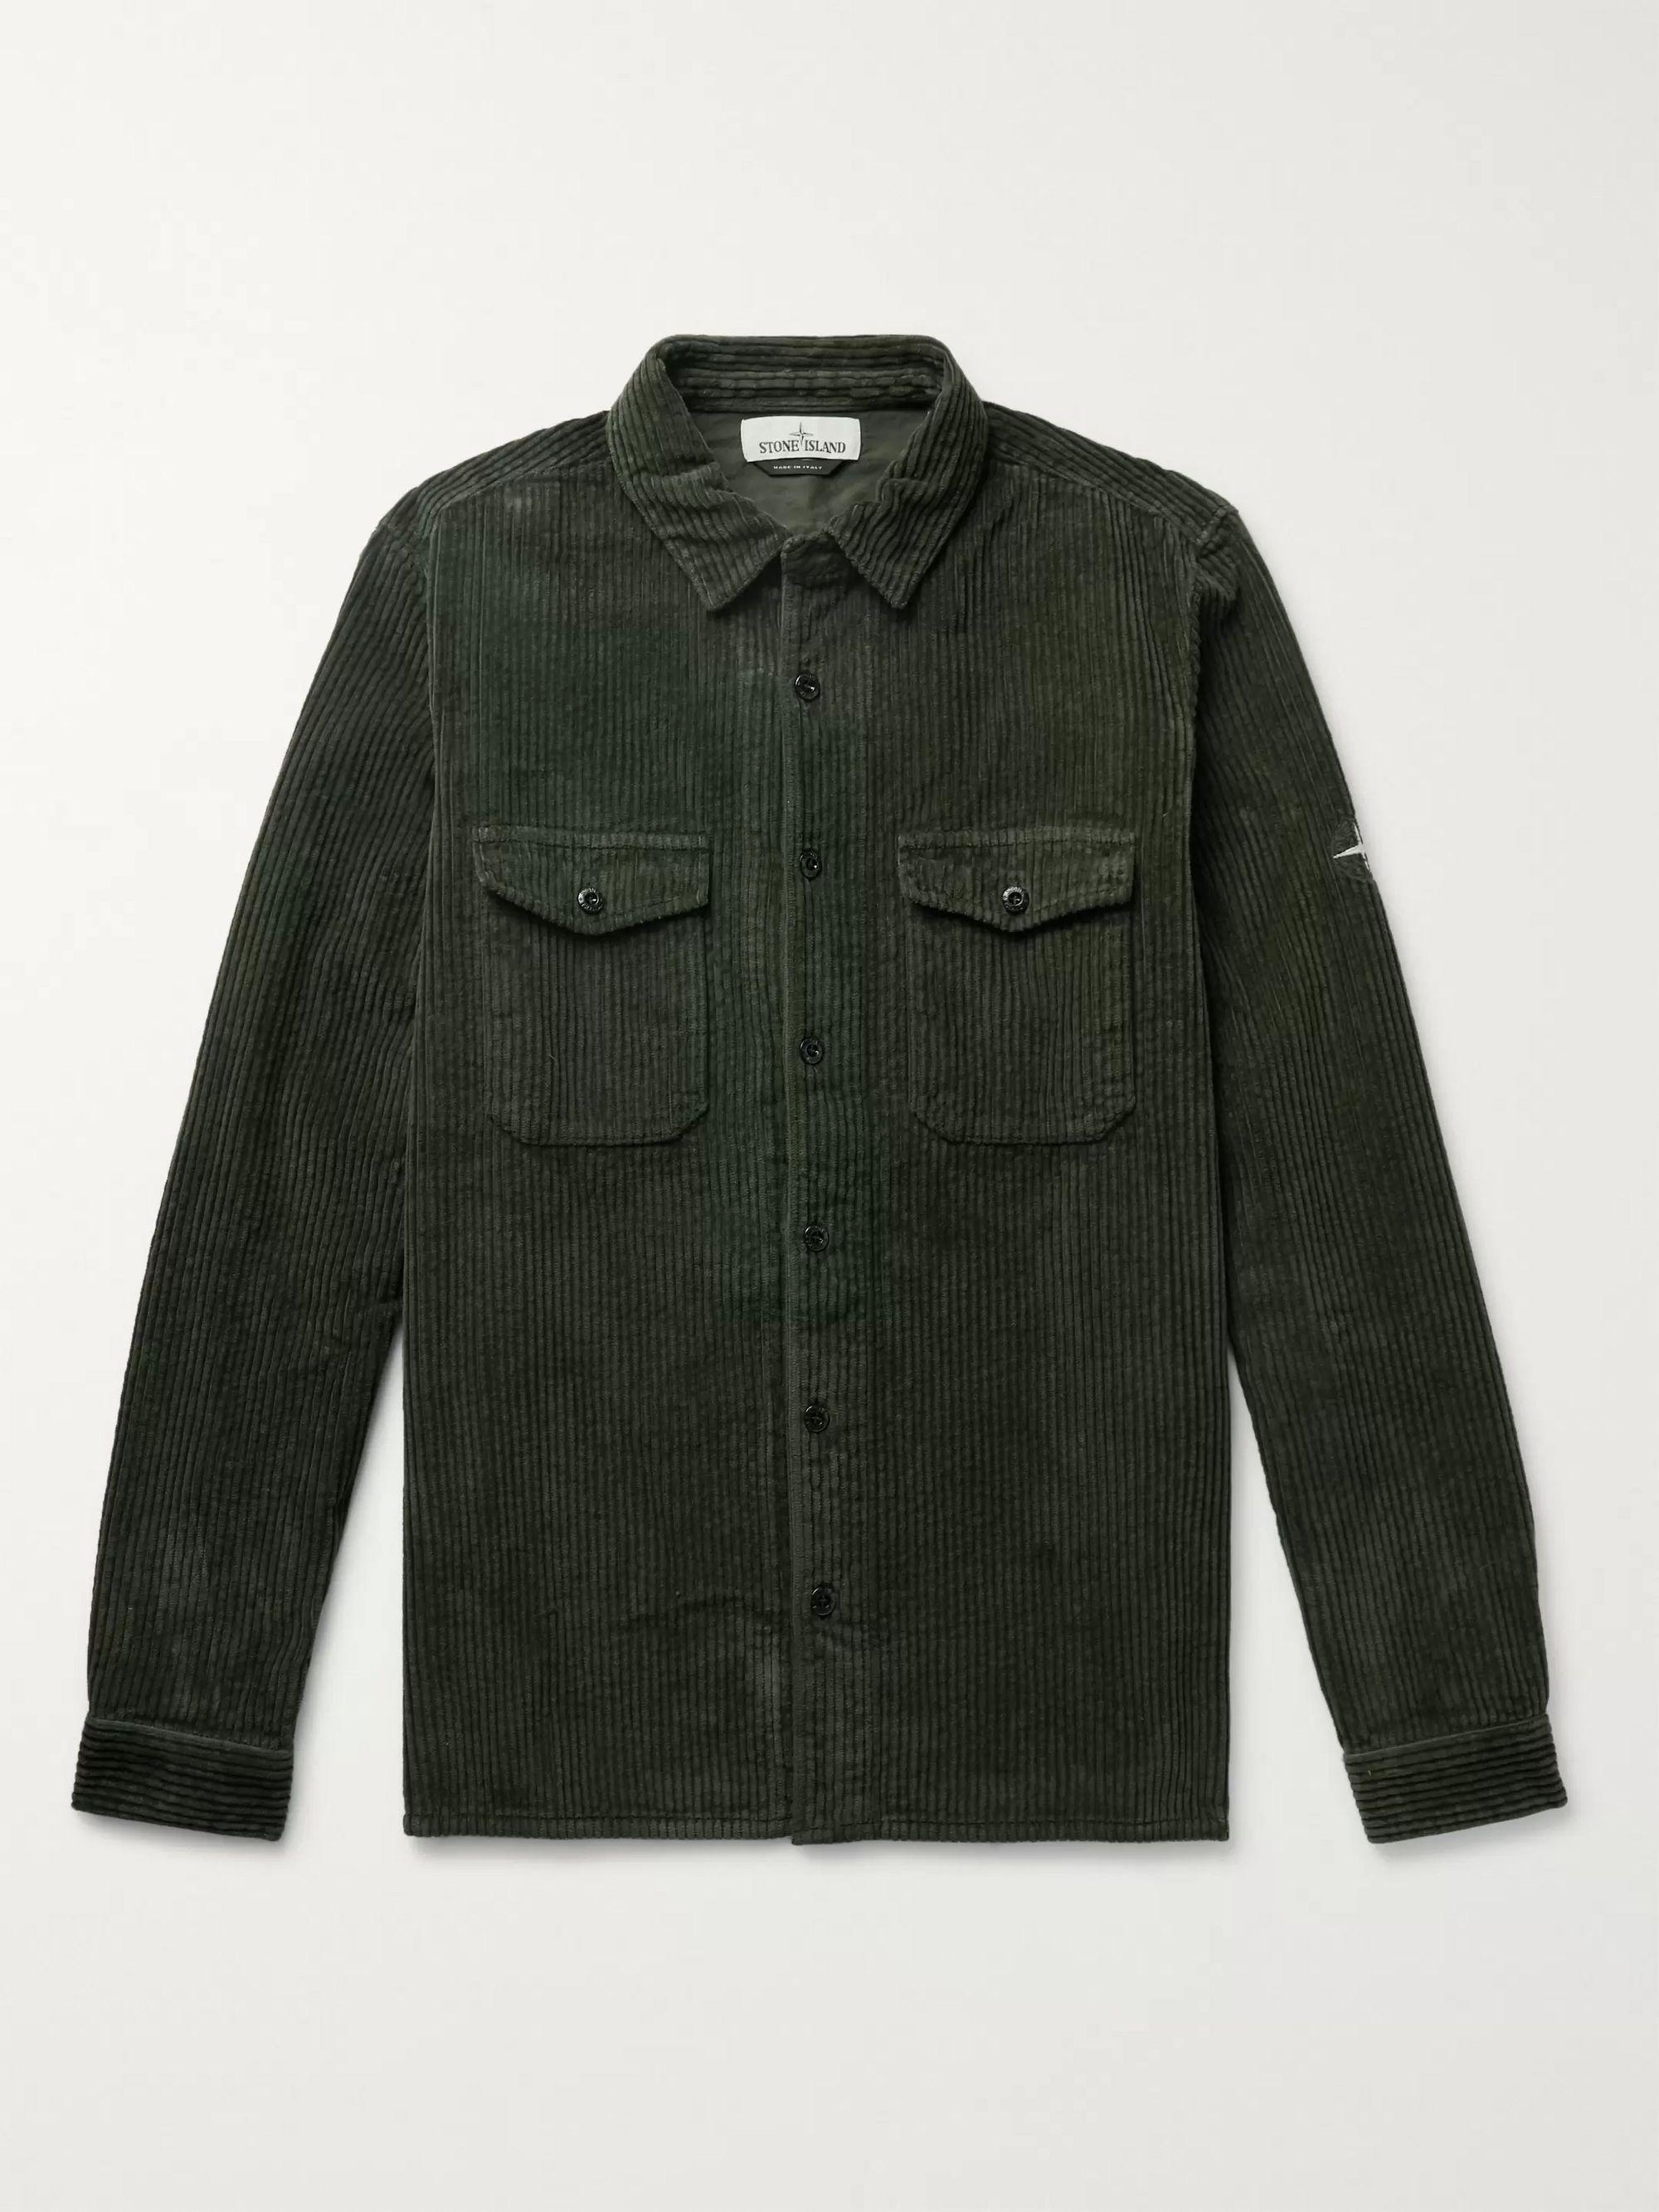 Army Green Cotton-corduroy Shirt | Stone Island